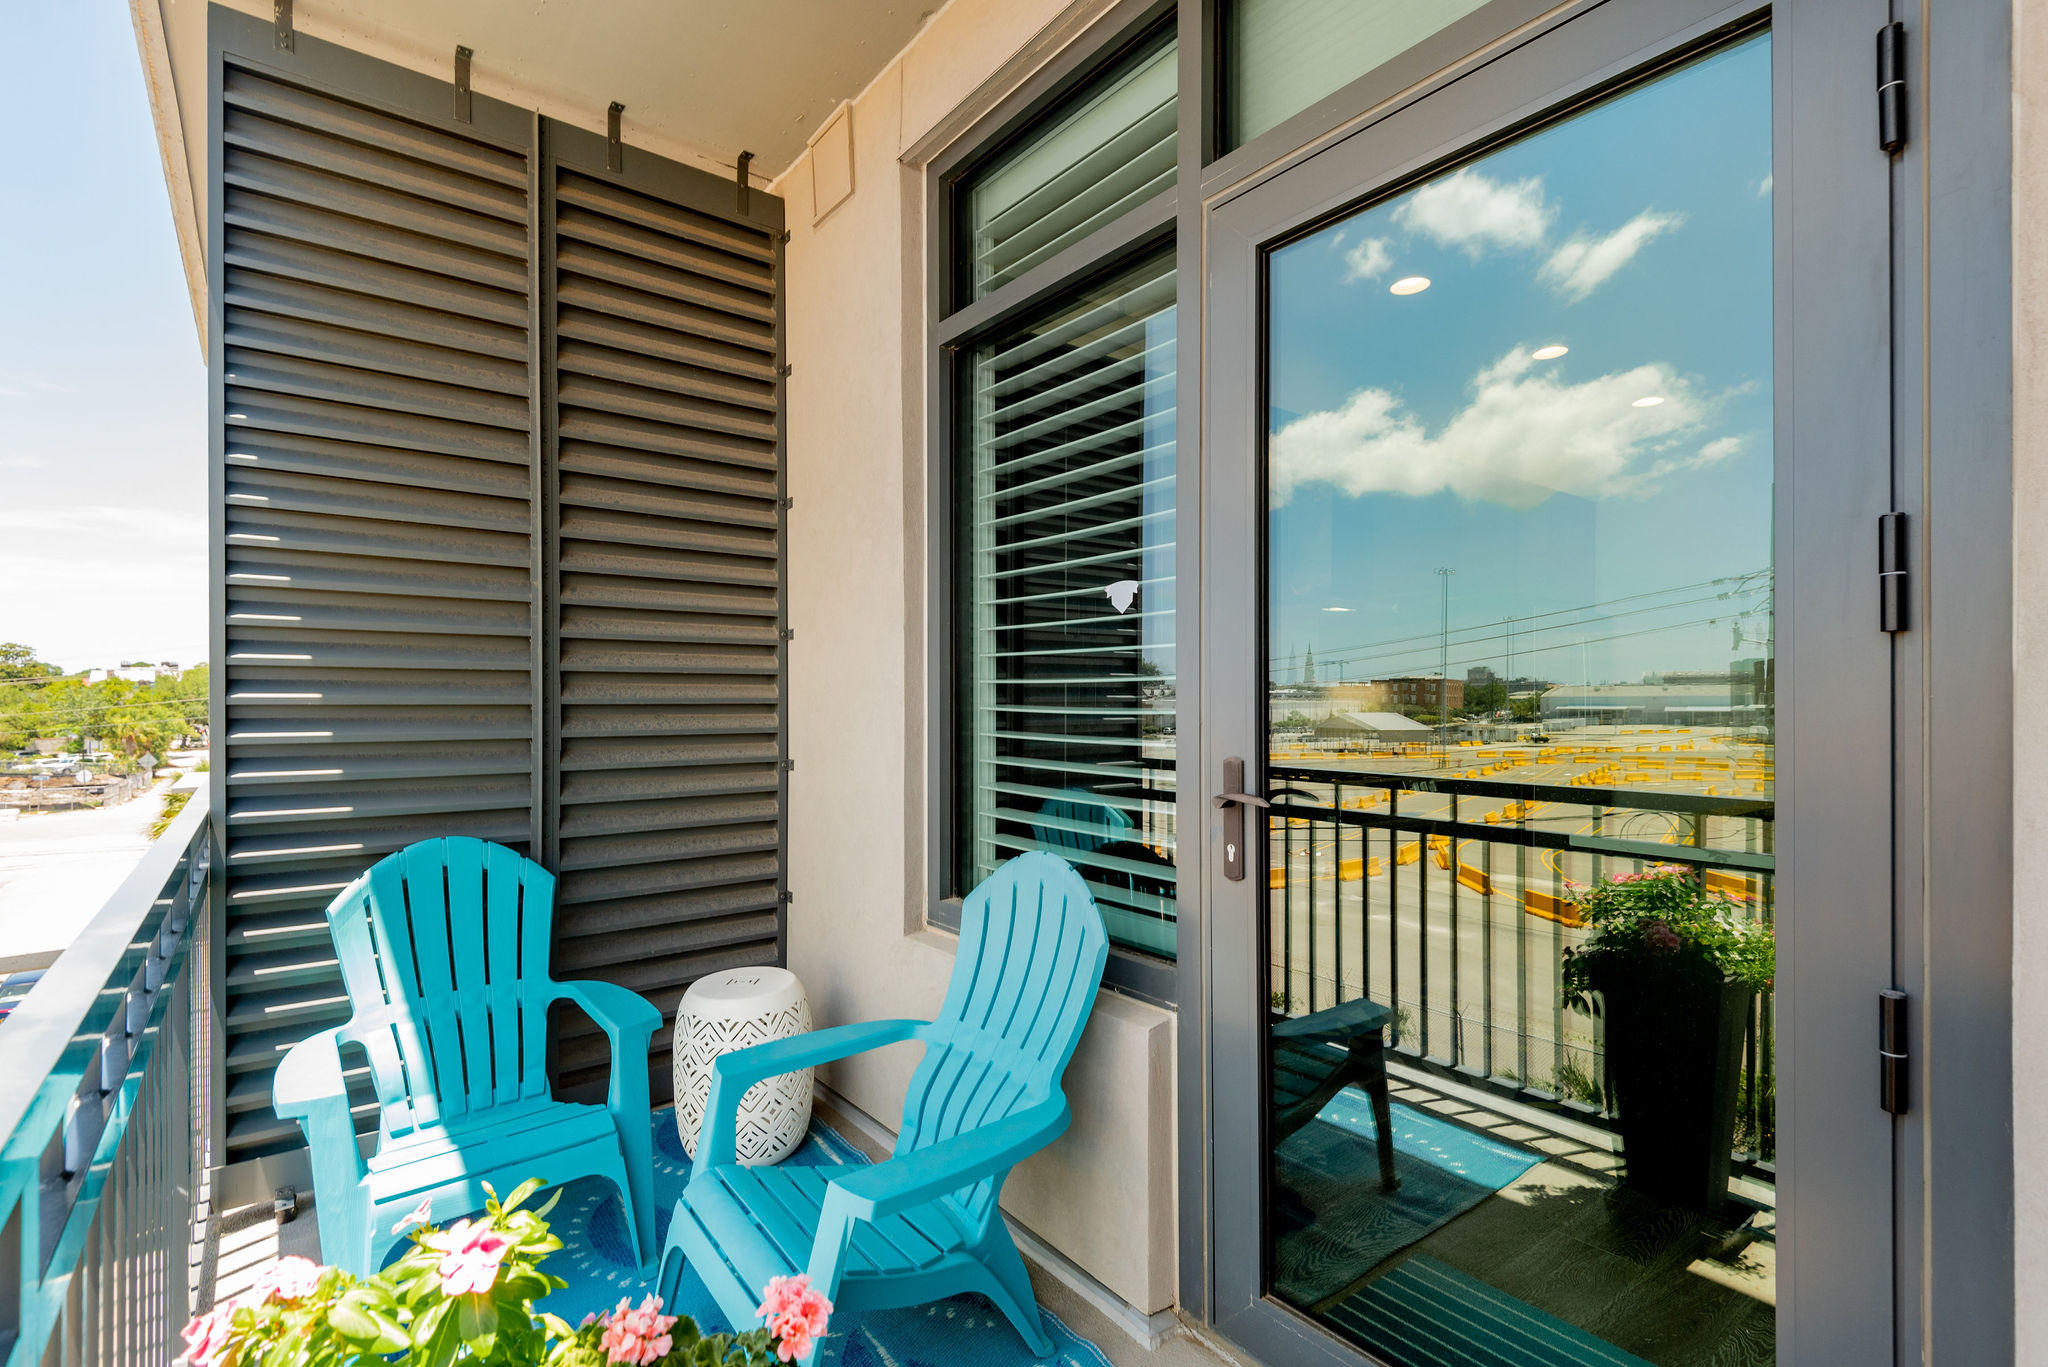 Gadsdenboro Homes For Sale - 5 Gadsdenboro, Charleston, SC - 23